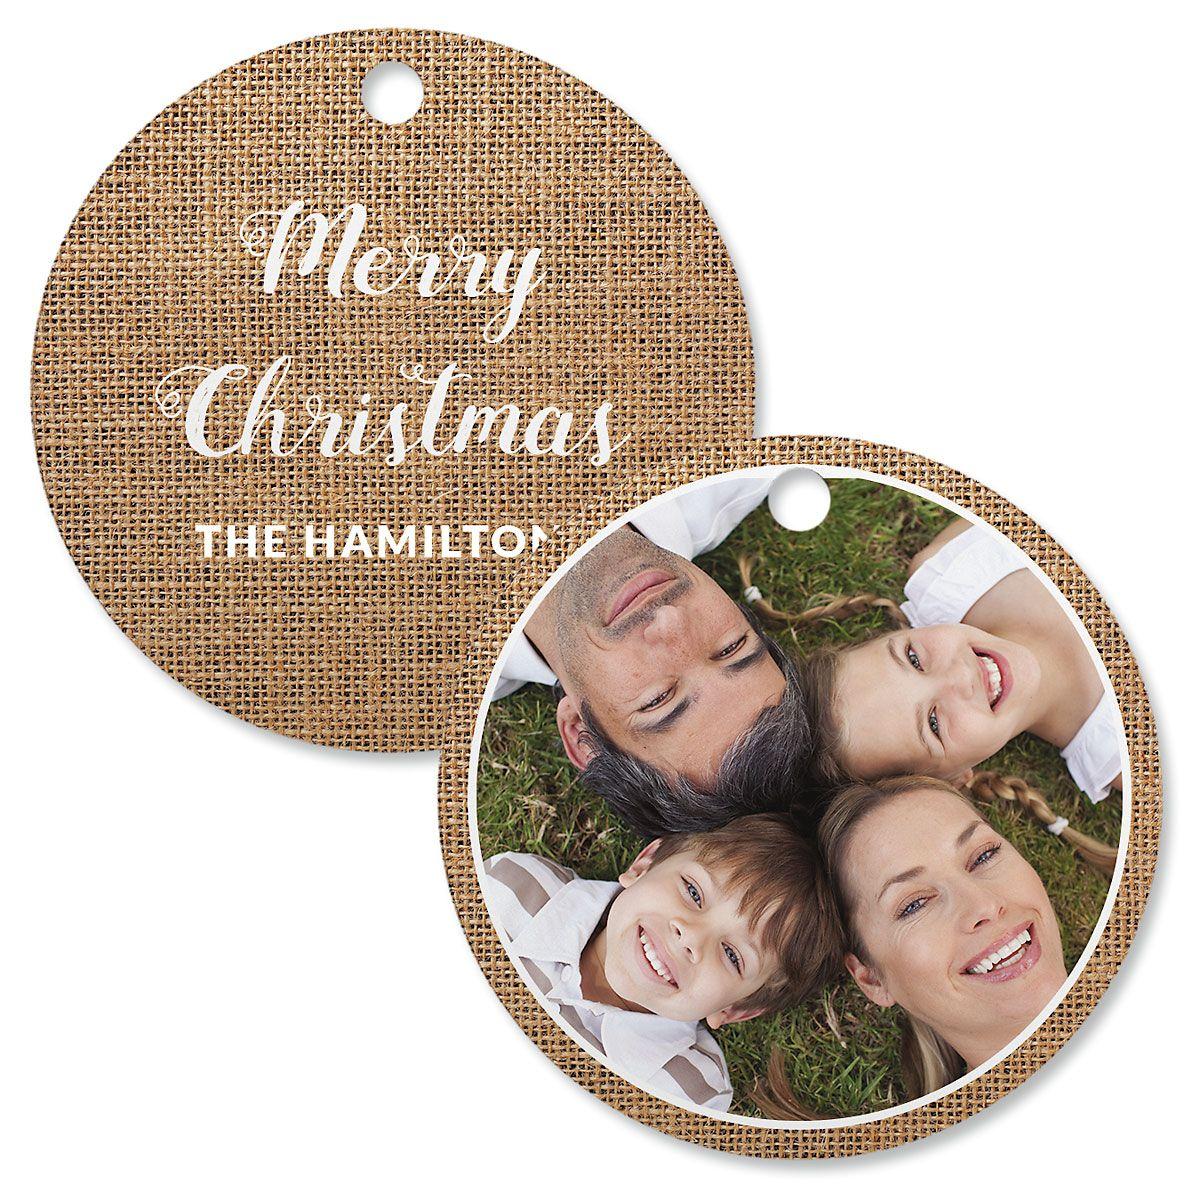 Burlap Personalized Photo Ornament – Circle